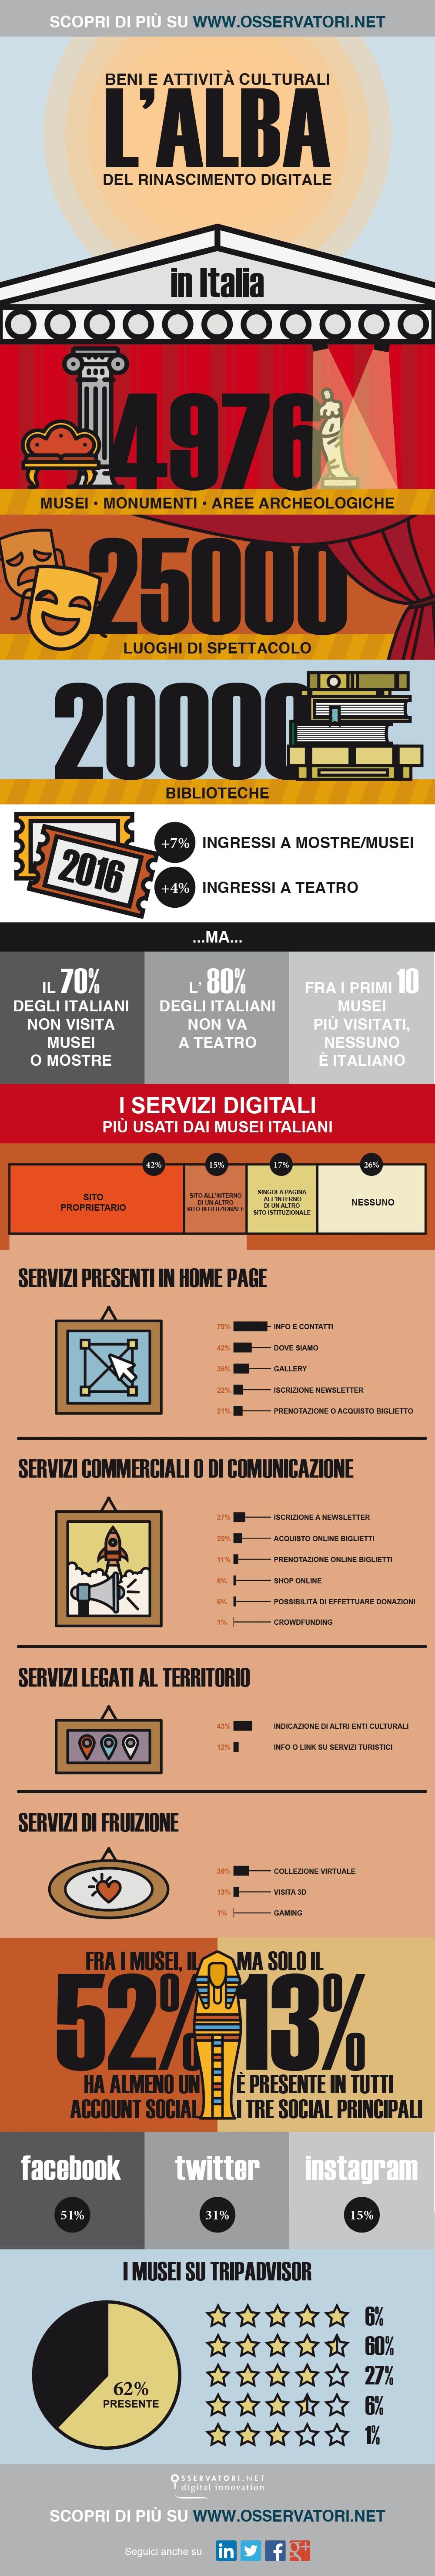 infografica musei osservatorio digitale